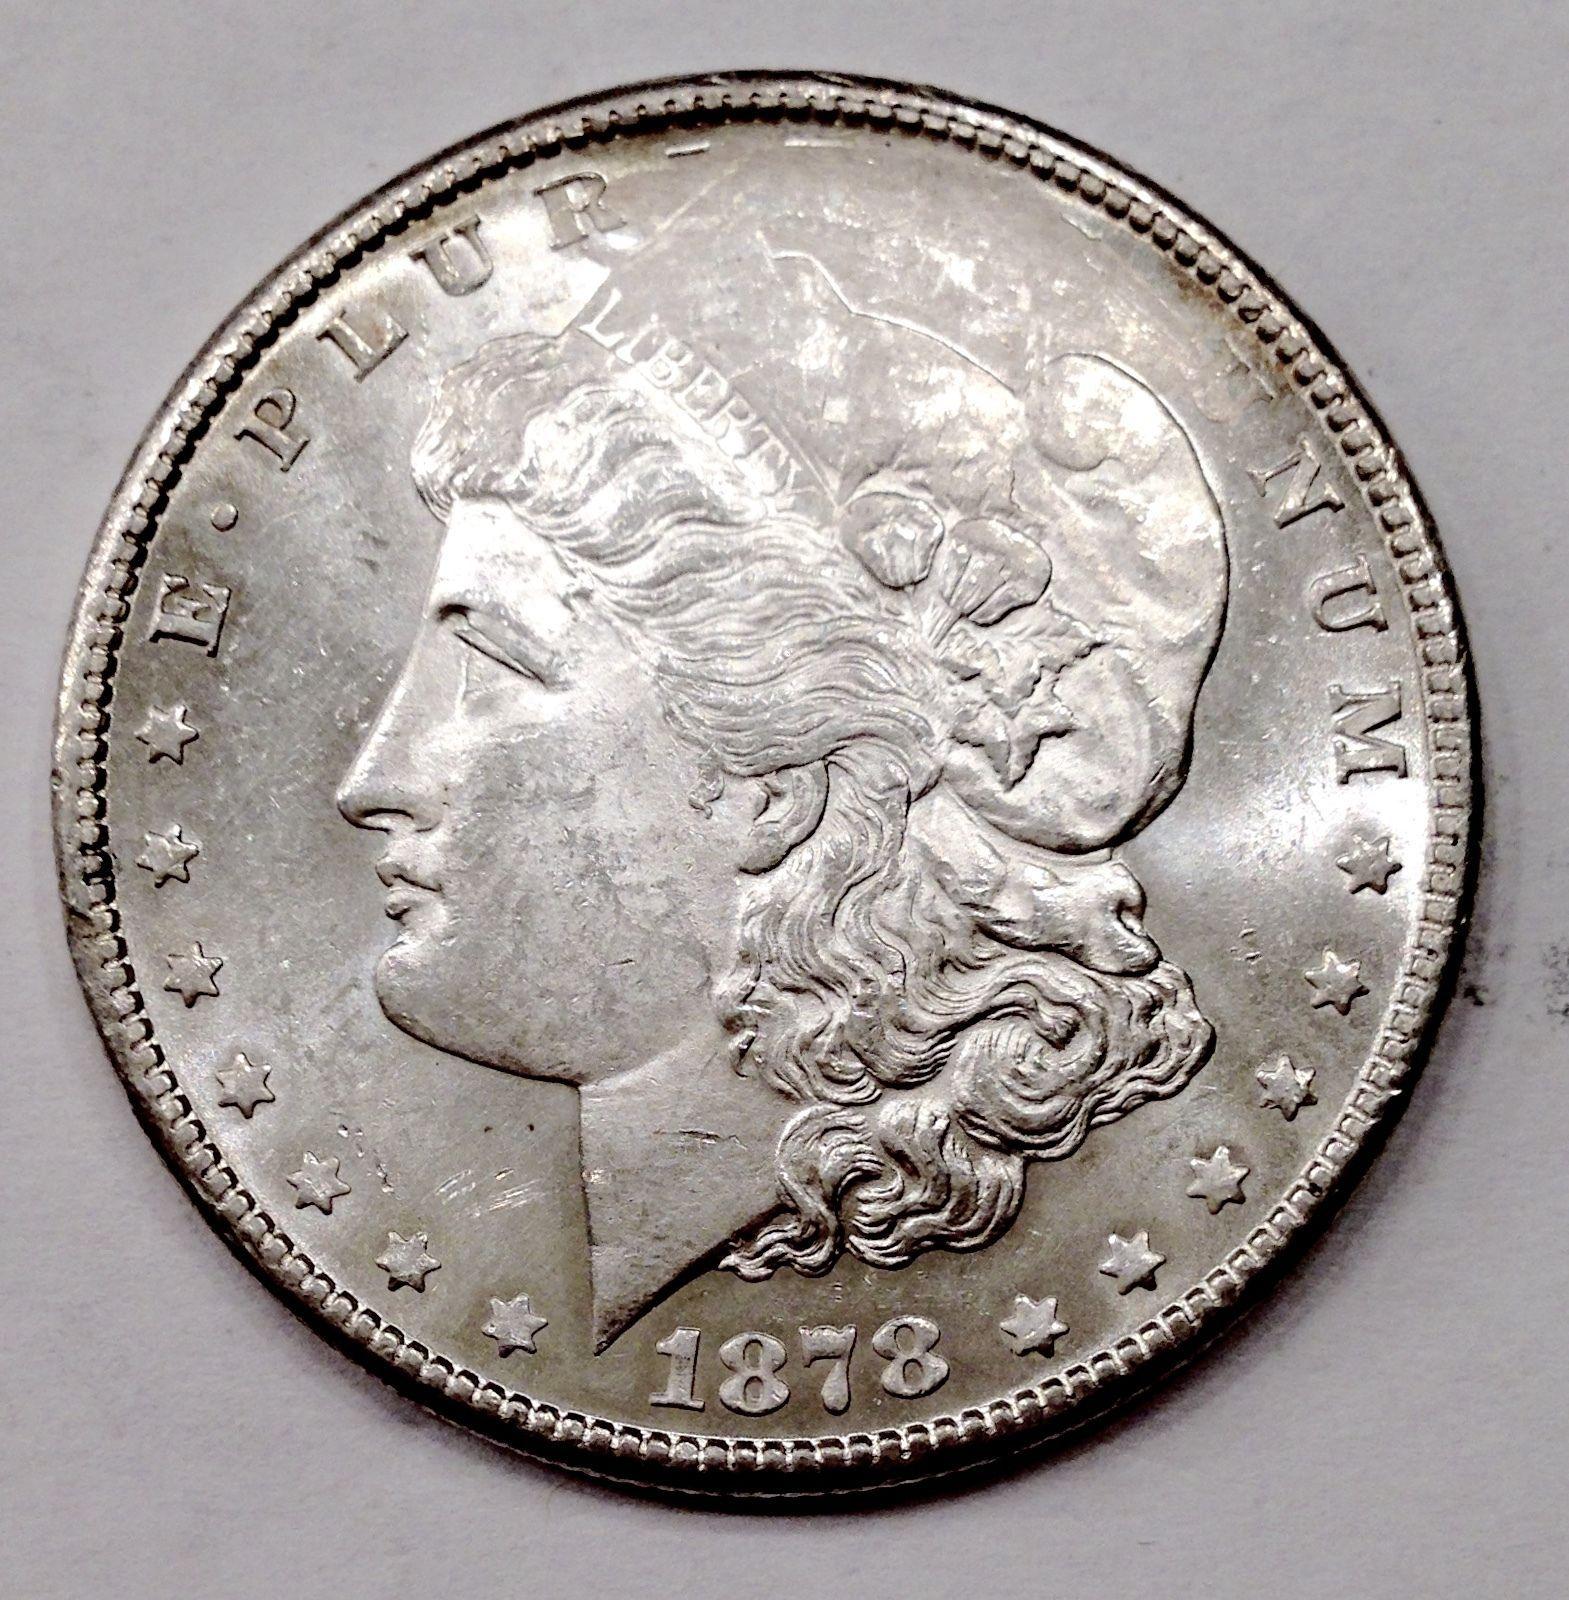 mint error coins